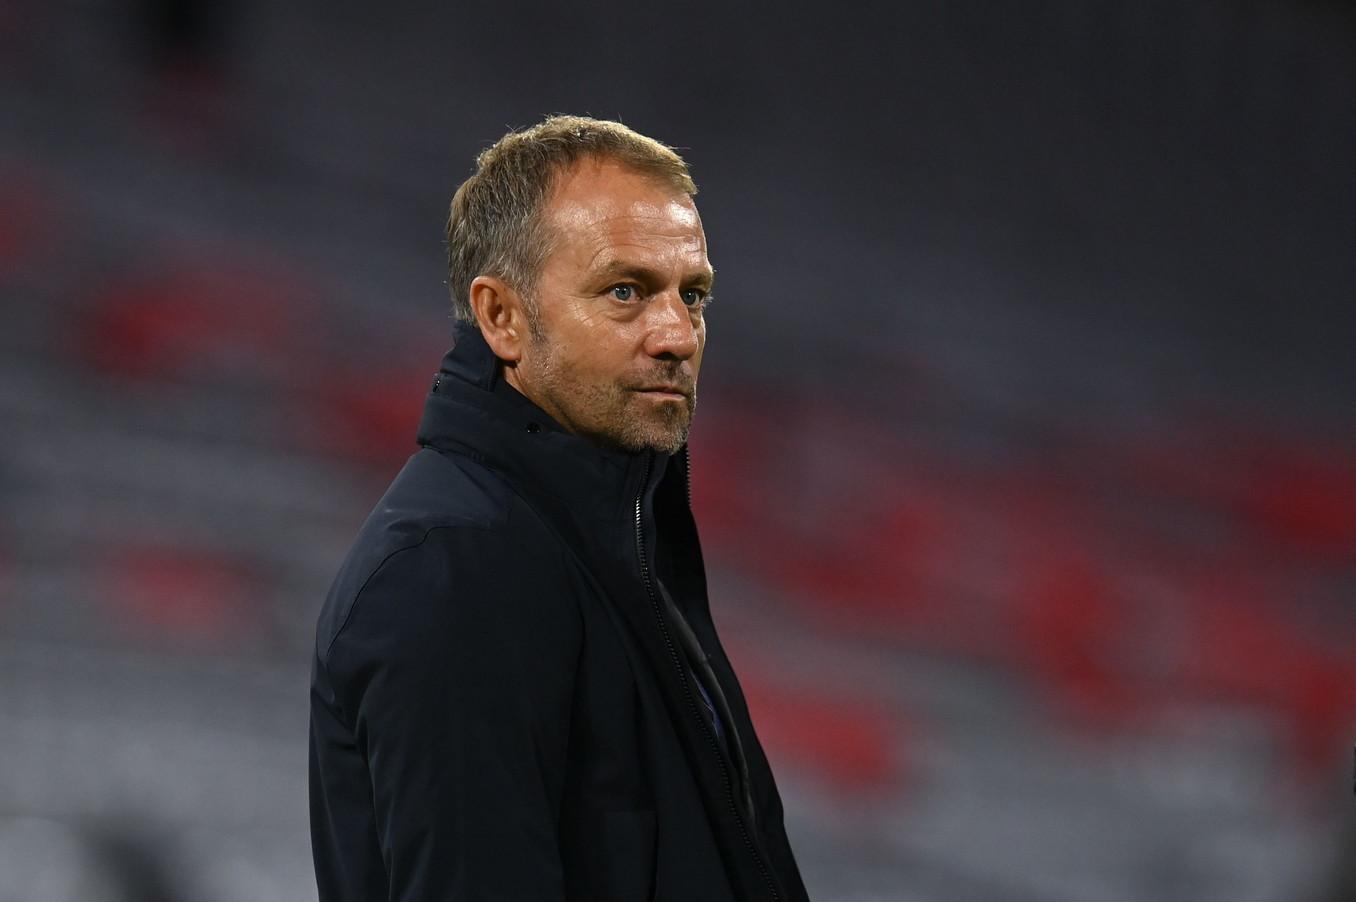 1) Flick (Bayern Monaco)